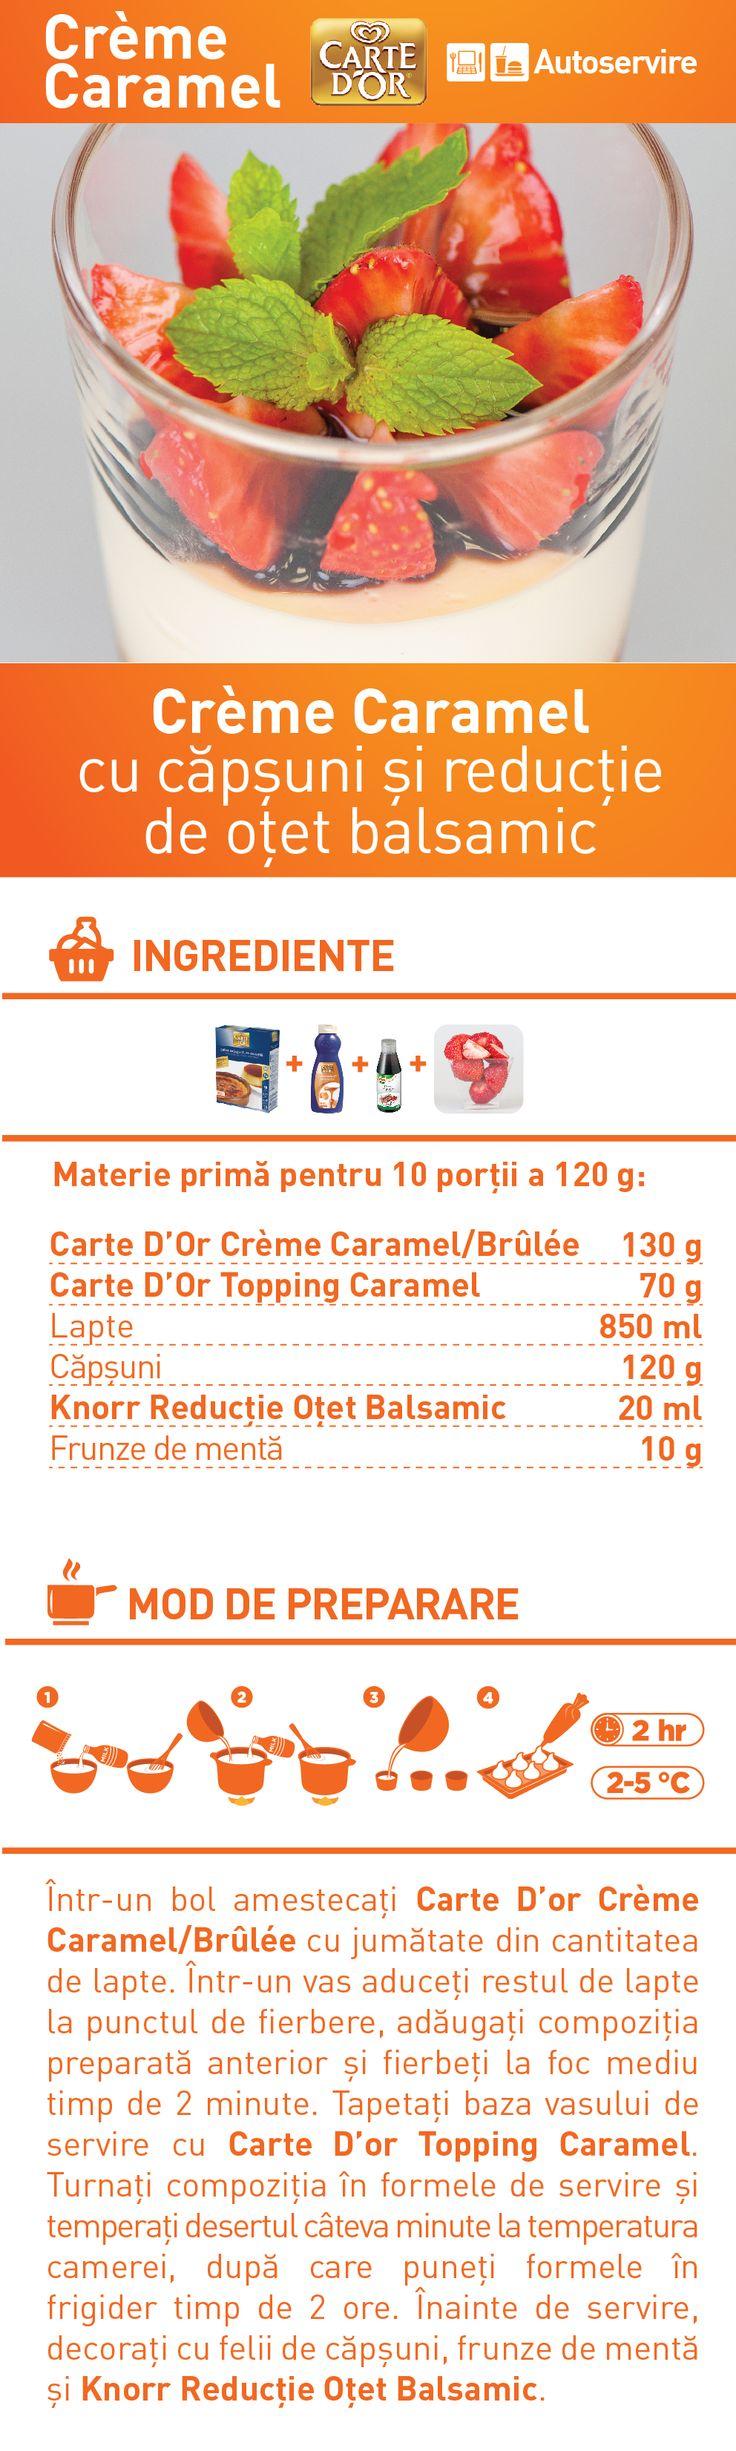 Creme Caramel cu capsuni si reductie de otet balsamic - RETETA